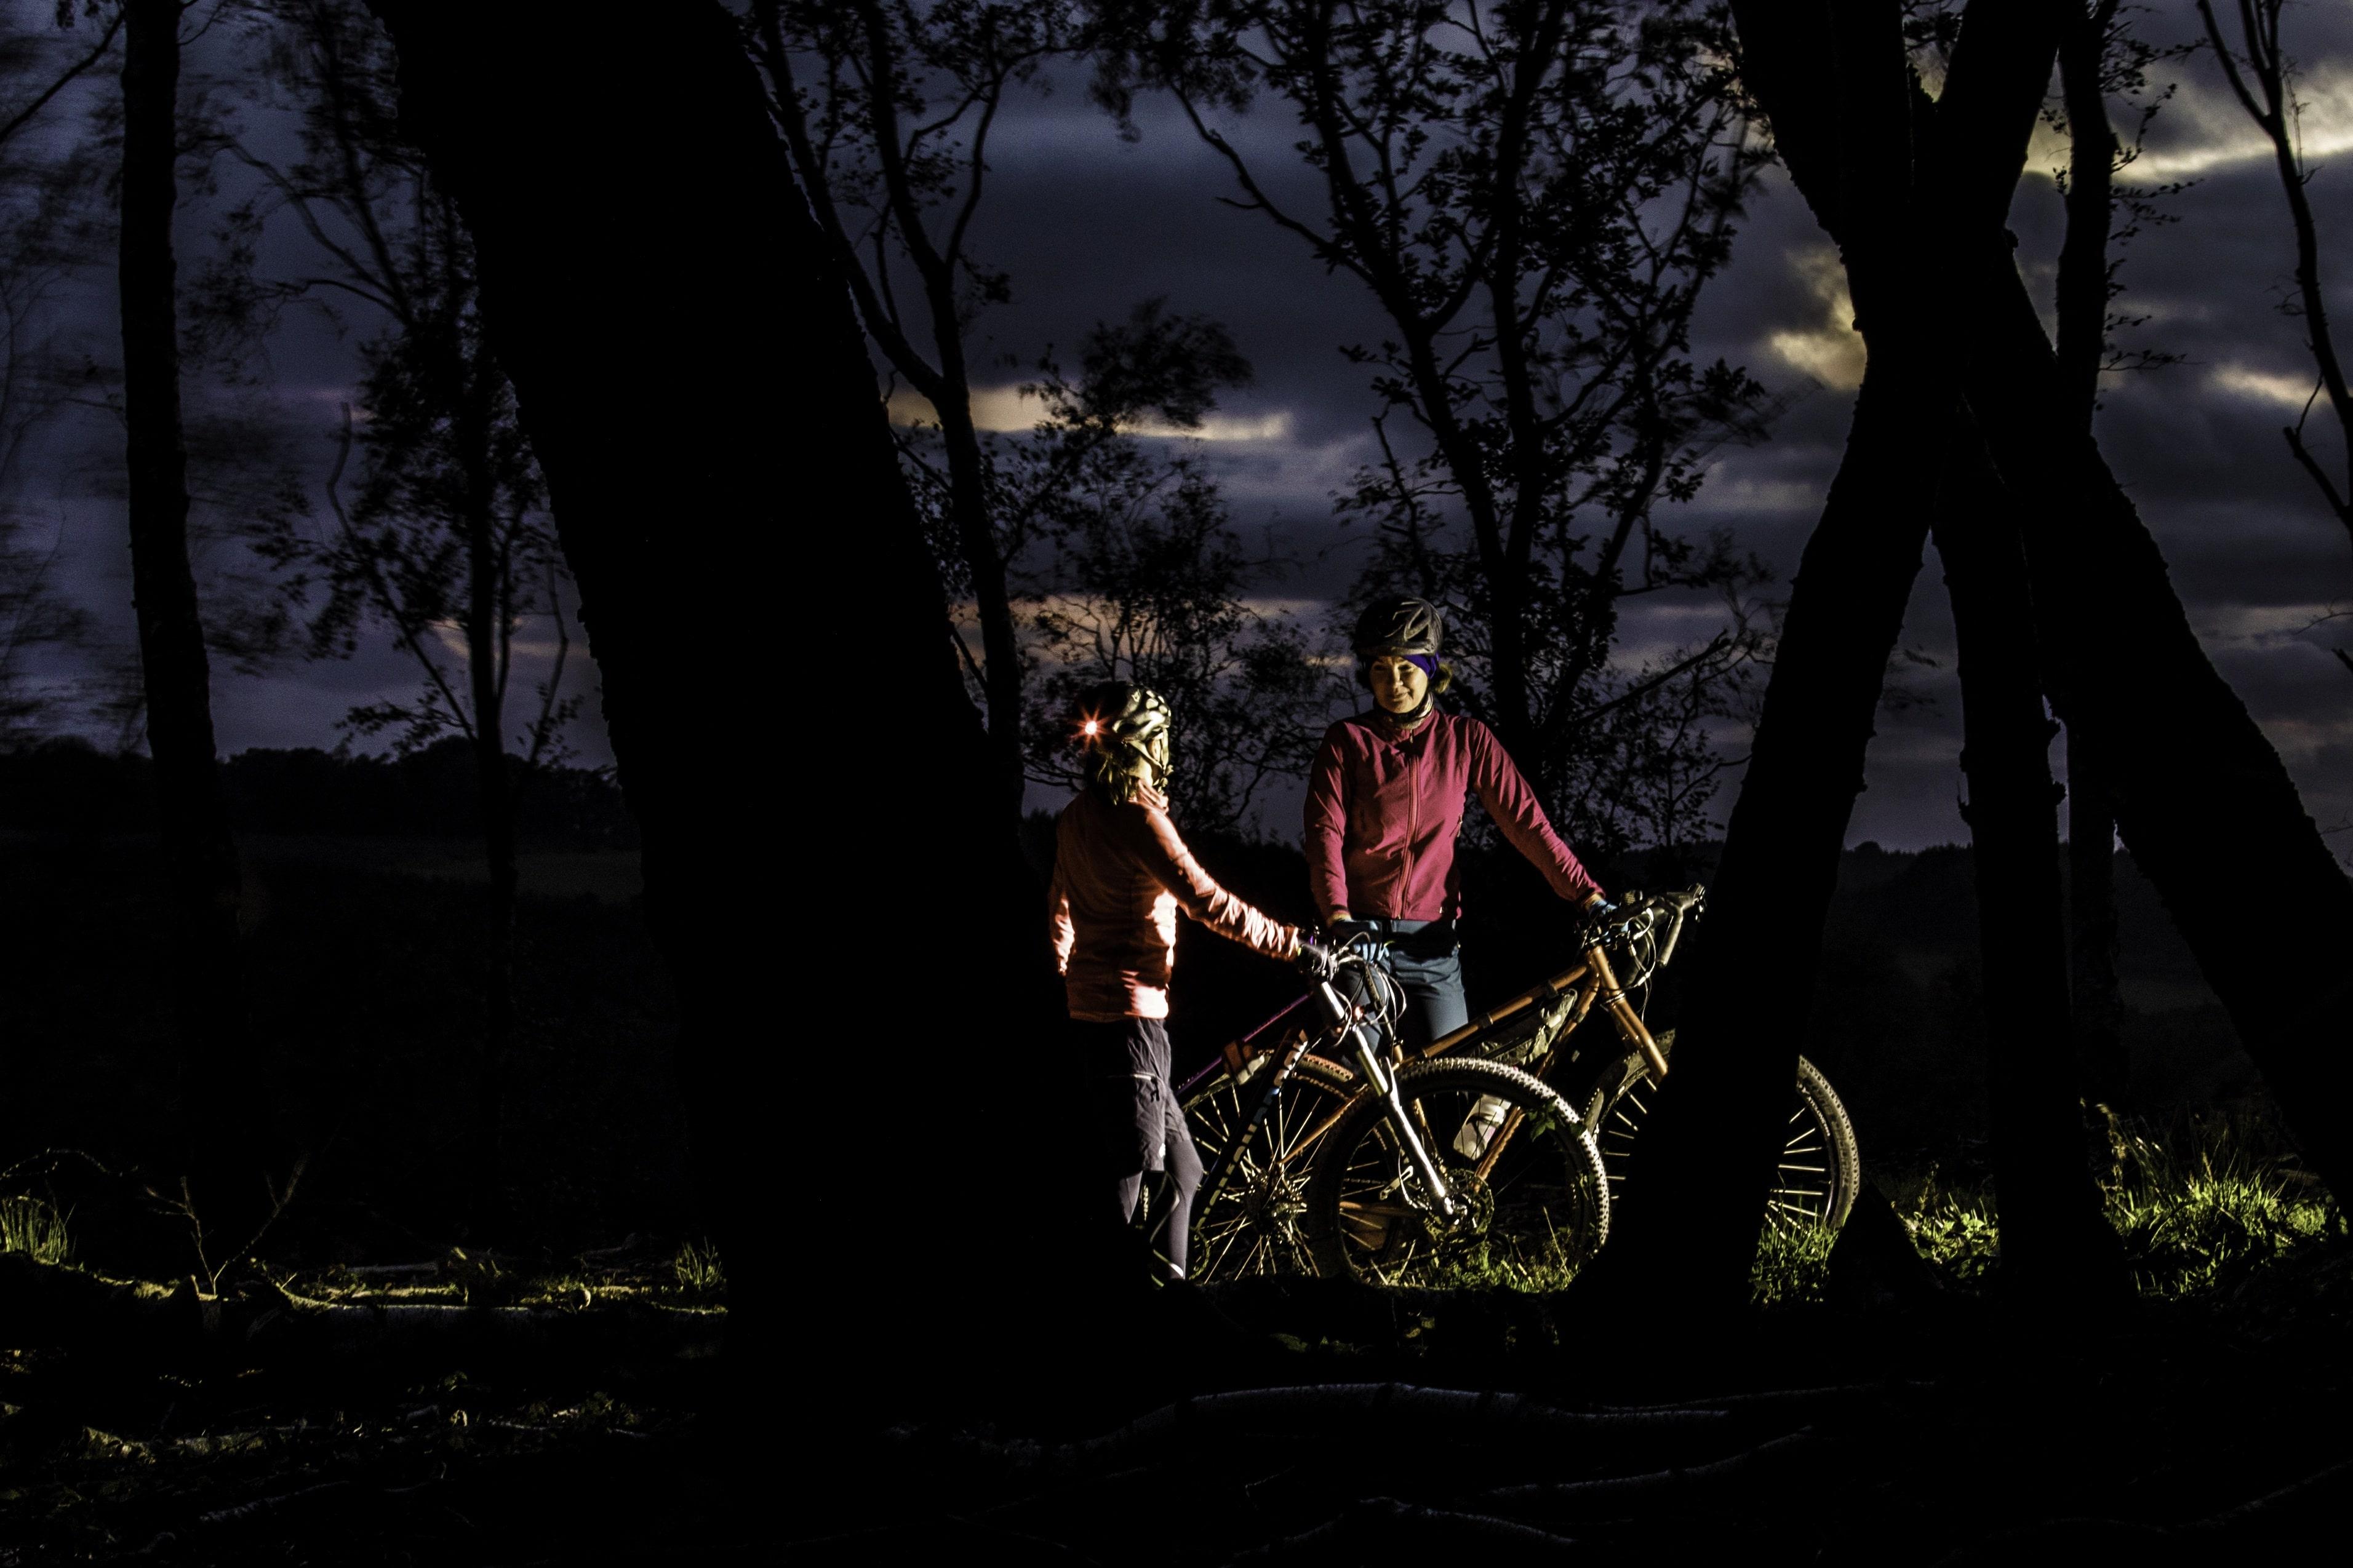 Dark Skies image by Mick Kirkman